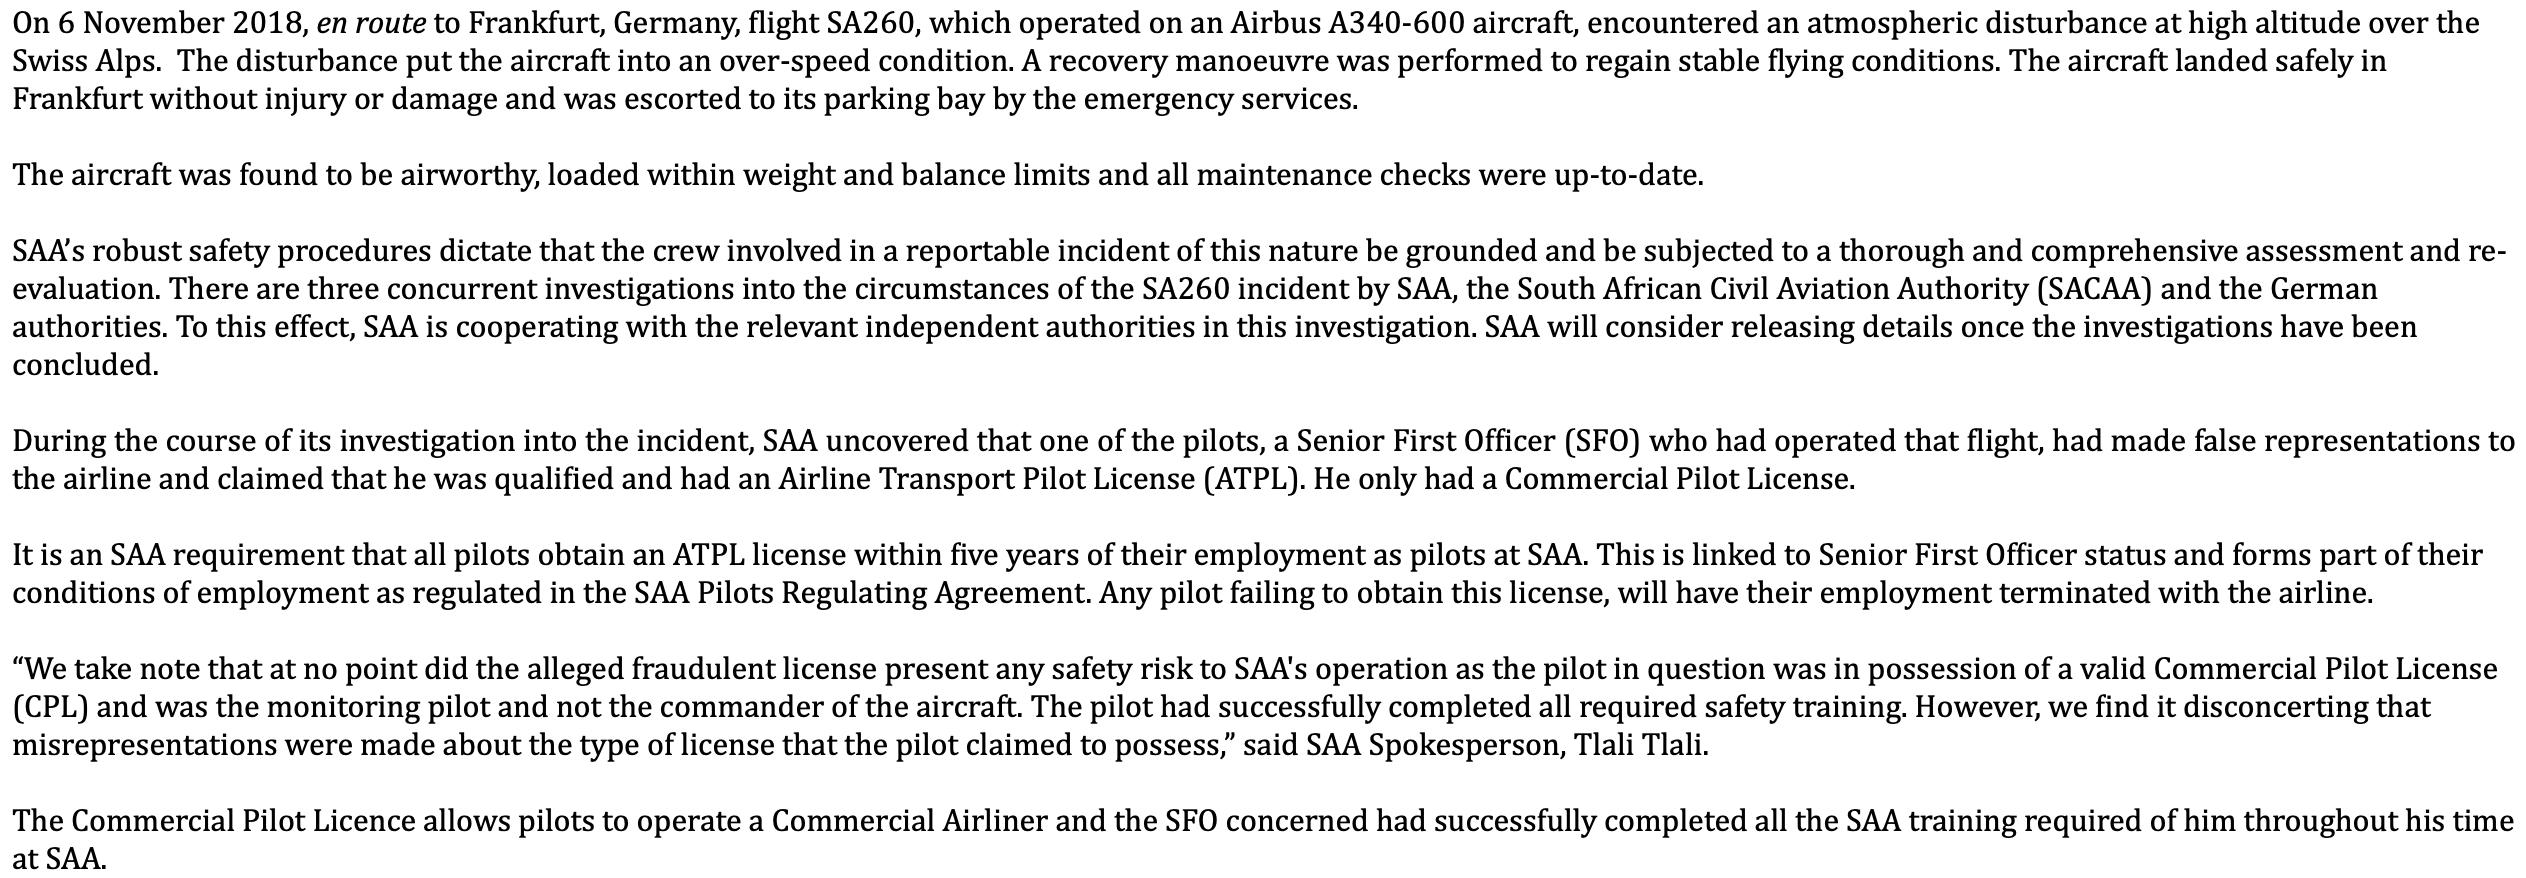 SAA statement Breakfast with Martin Bester